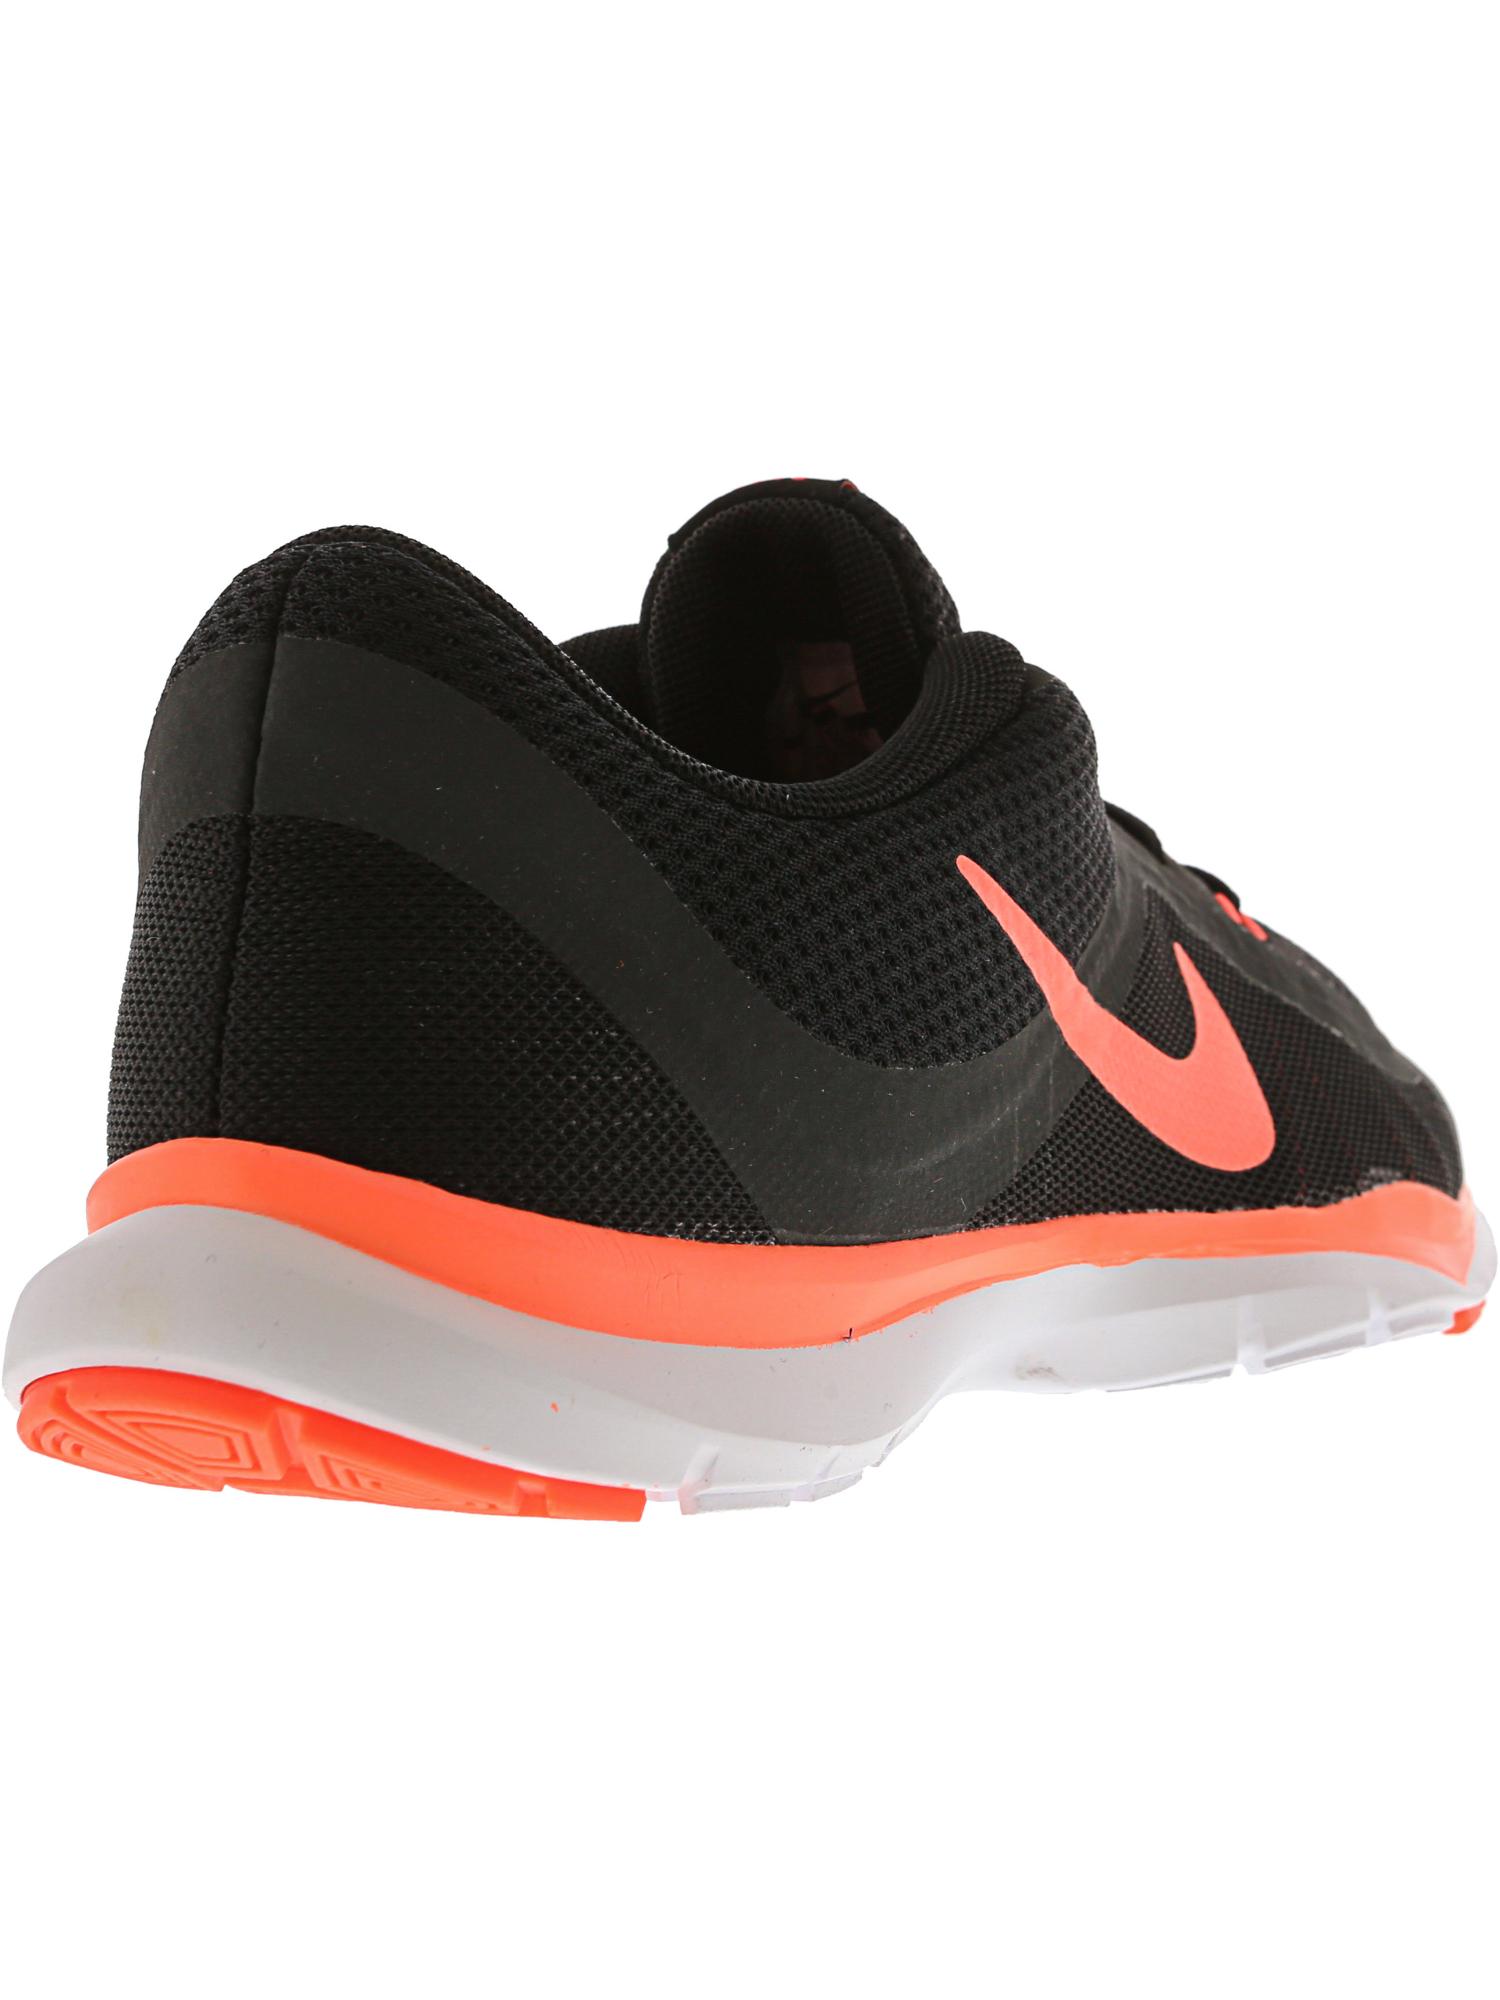 378630a8b0a7 Nike Women s Flex Trainer 6 Ankle-High Mesh Walking Shoe